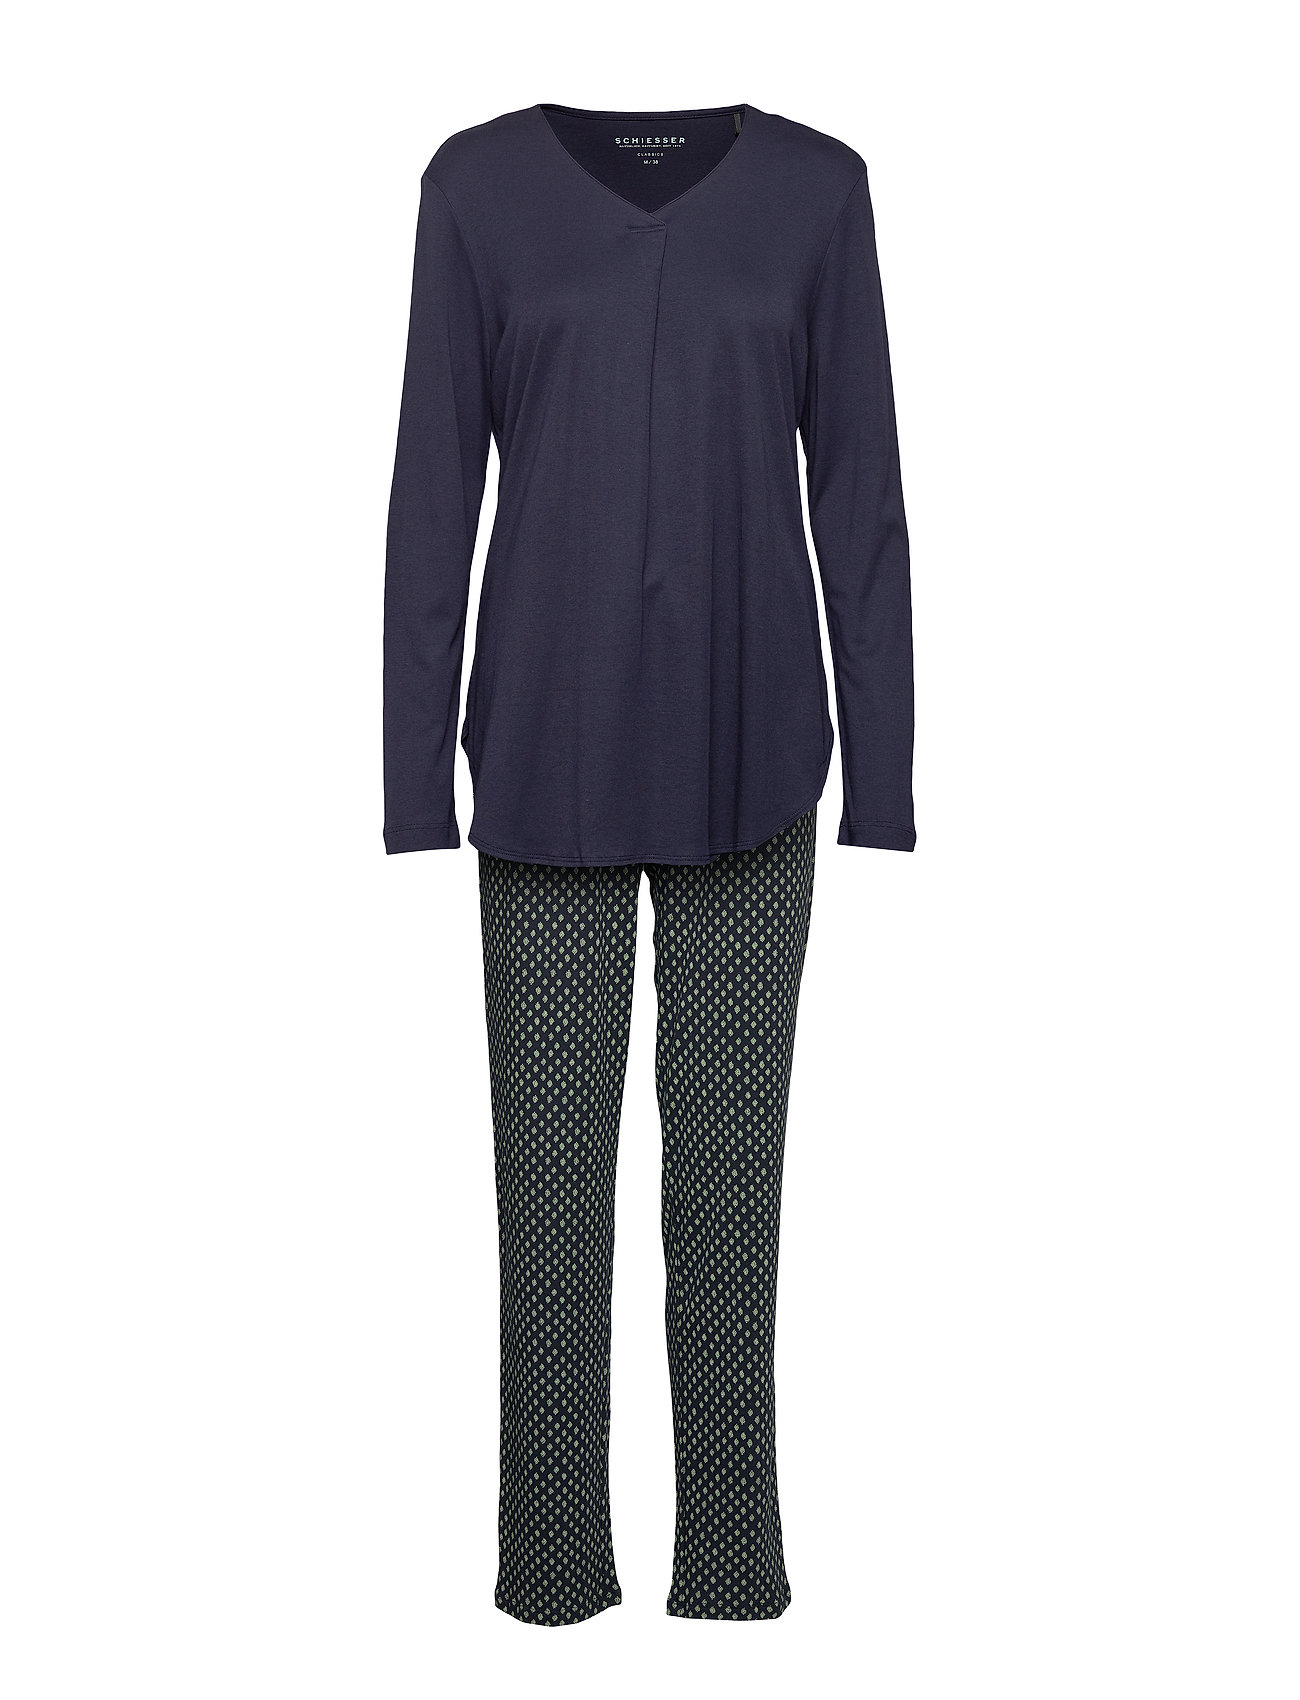 Schiesser Pyjama Long - NIGHTBLUE